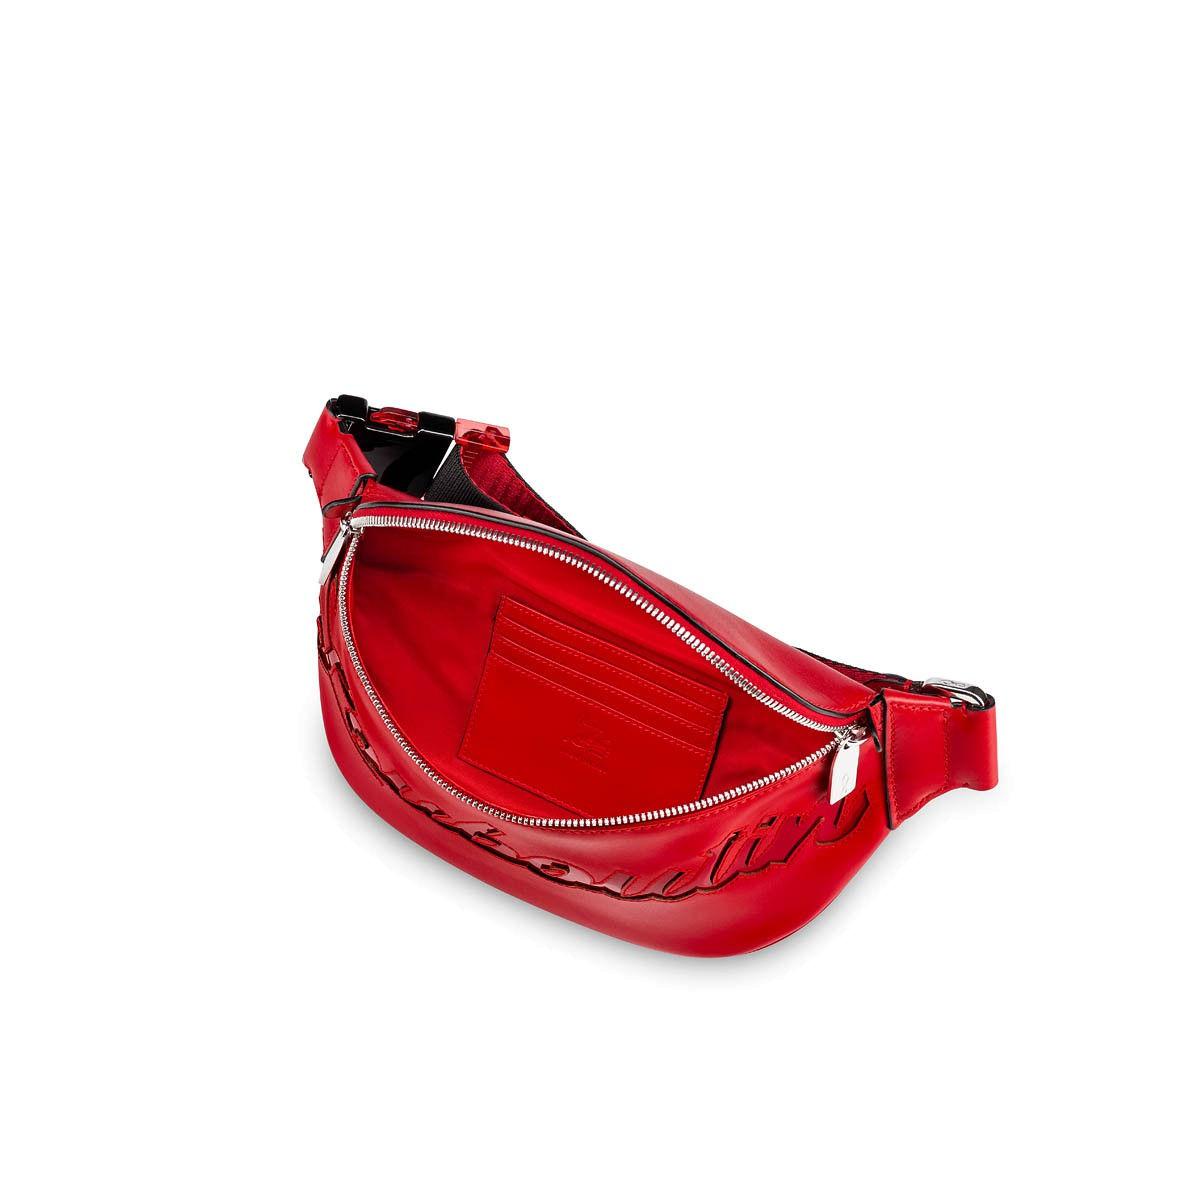 Bags - Marie Jane Belt Bag - Christian Louboutin